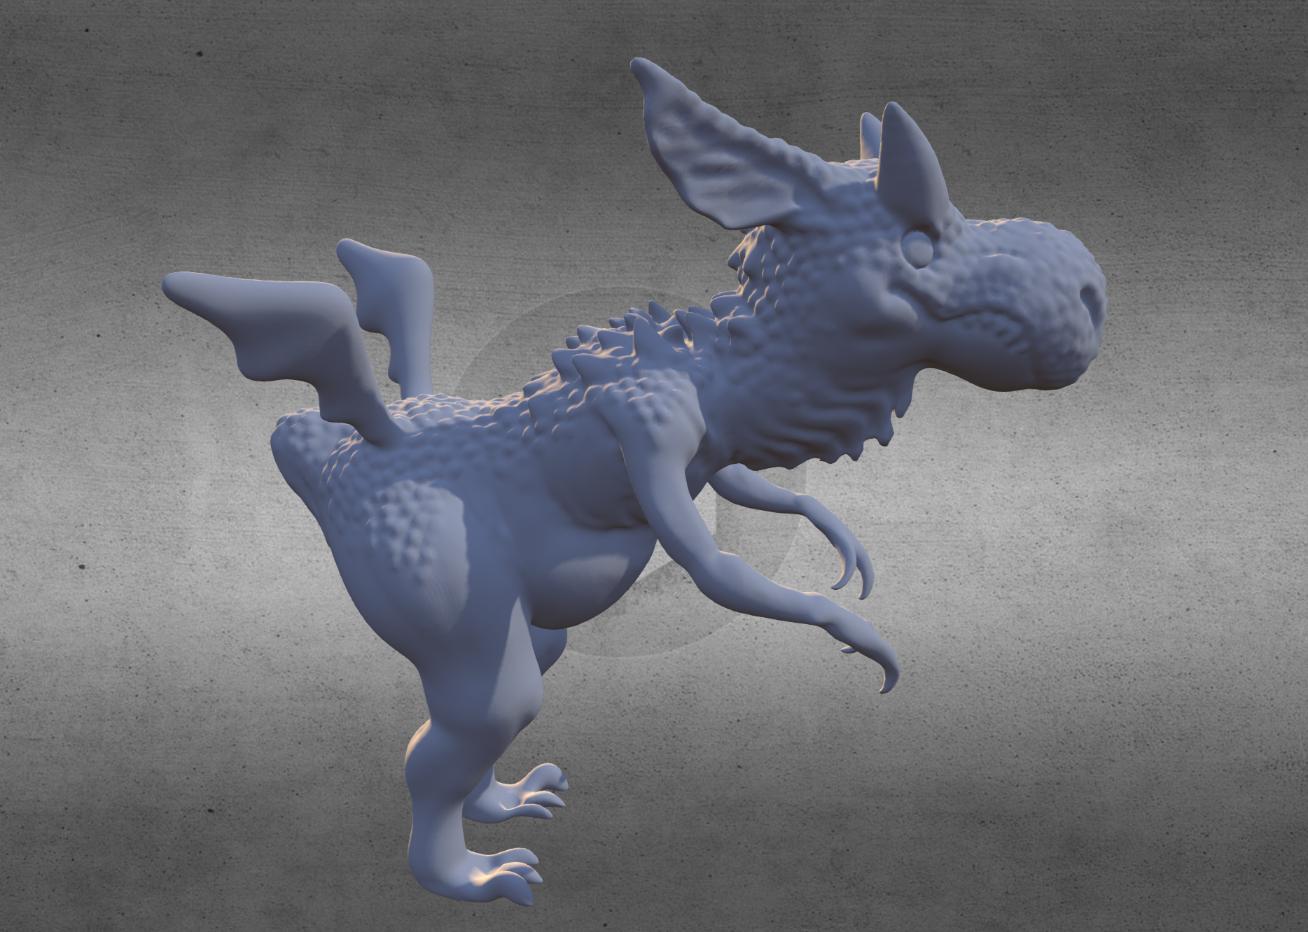 dragosaurmodel1.png